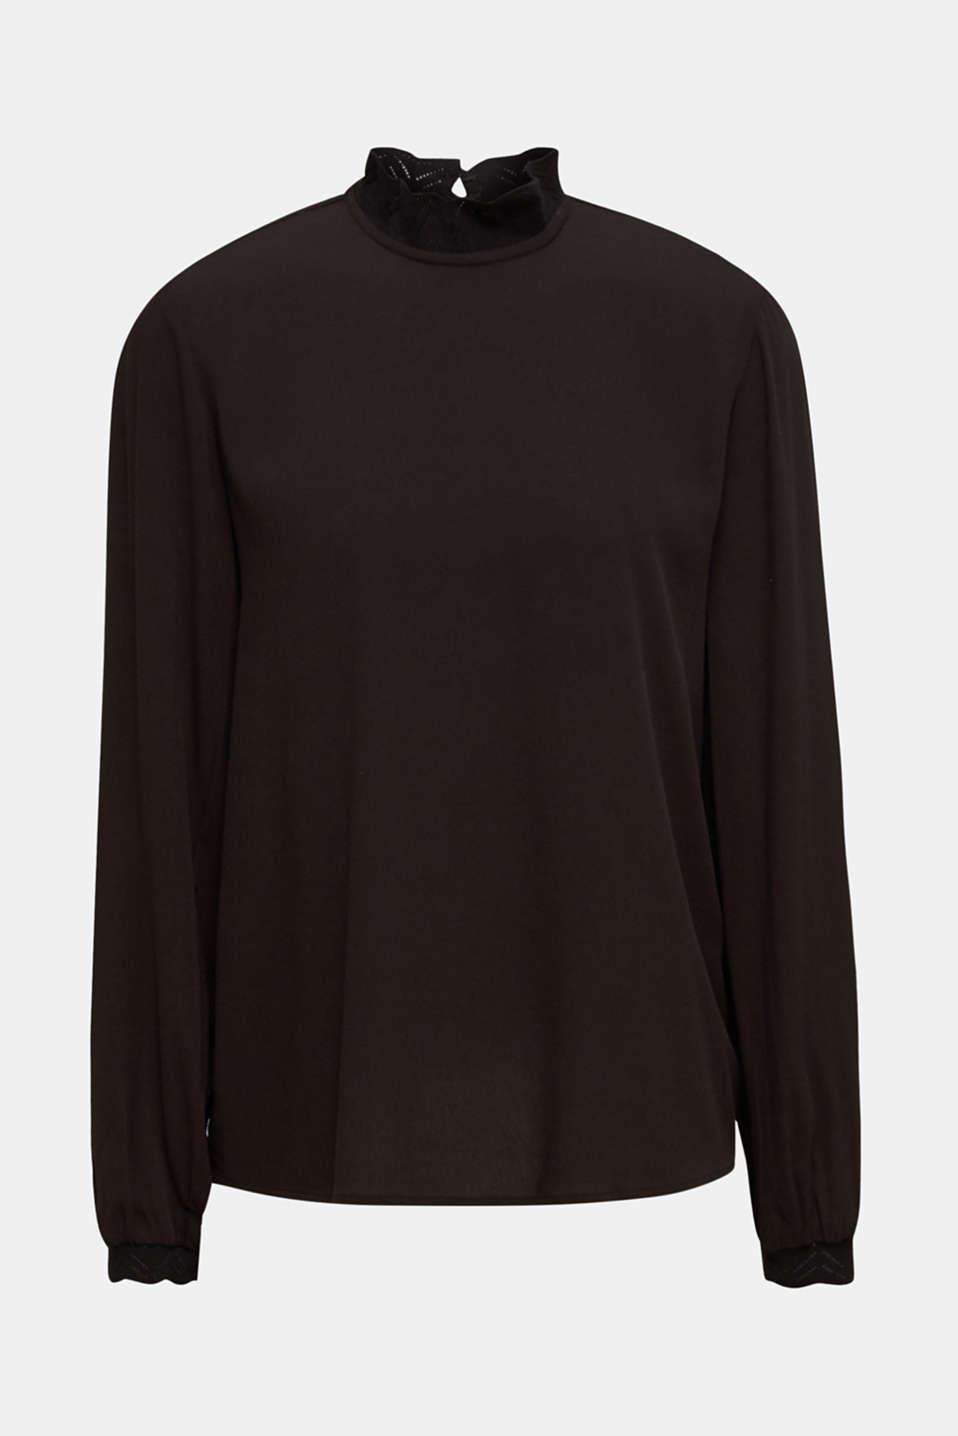 Crêpe blouse with openwork details, BLACK, detail image number 4